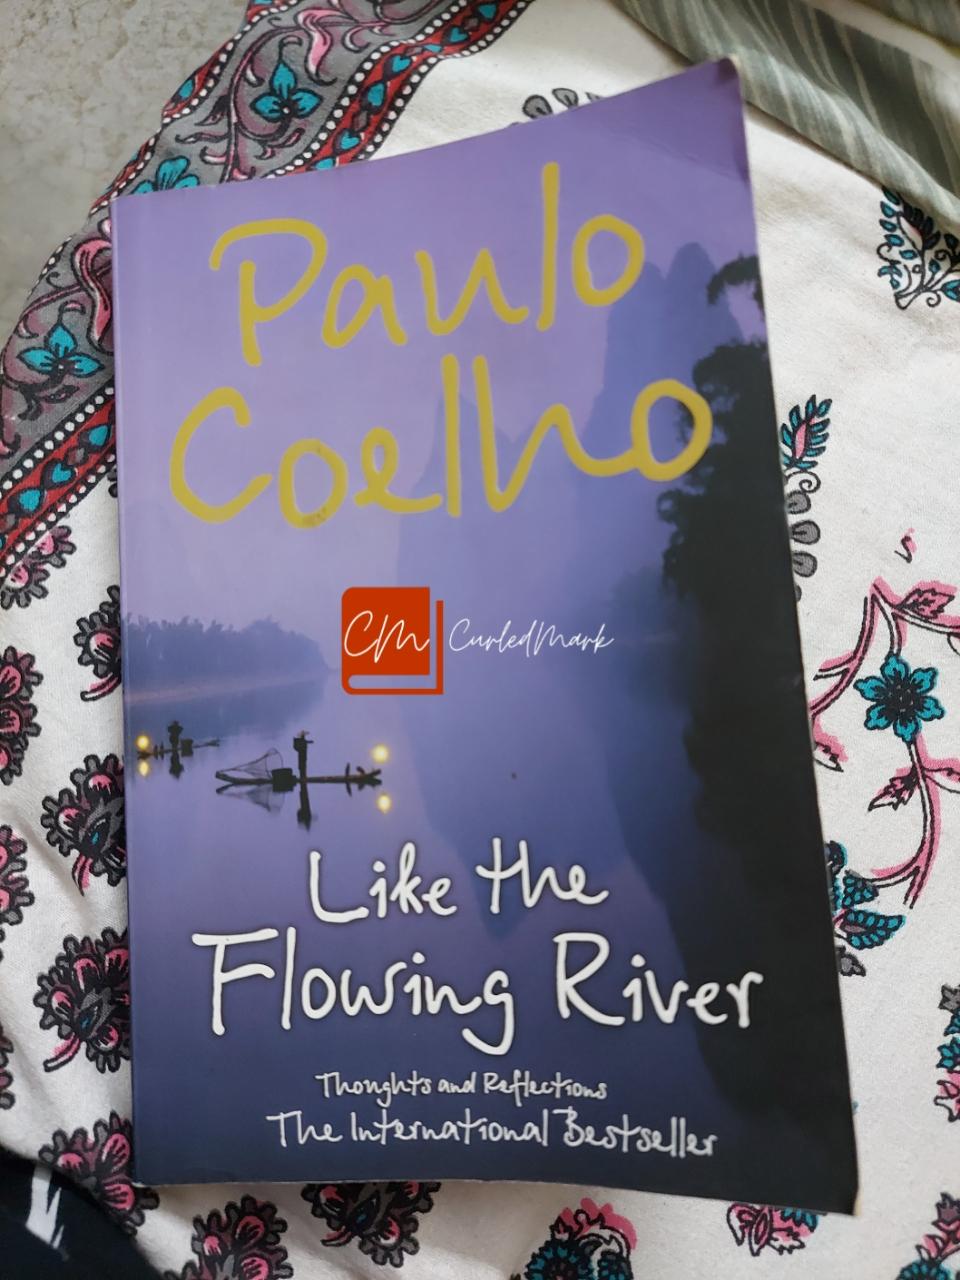 Like the flowing river by Paulo Coelho Summary